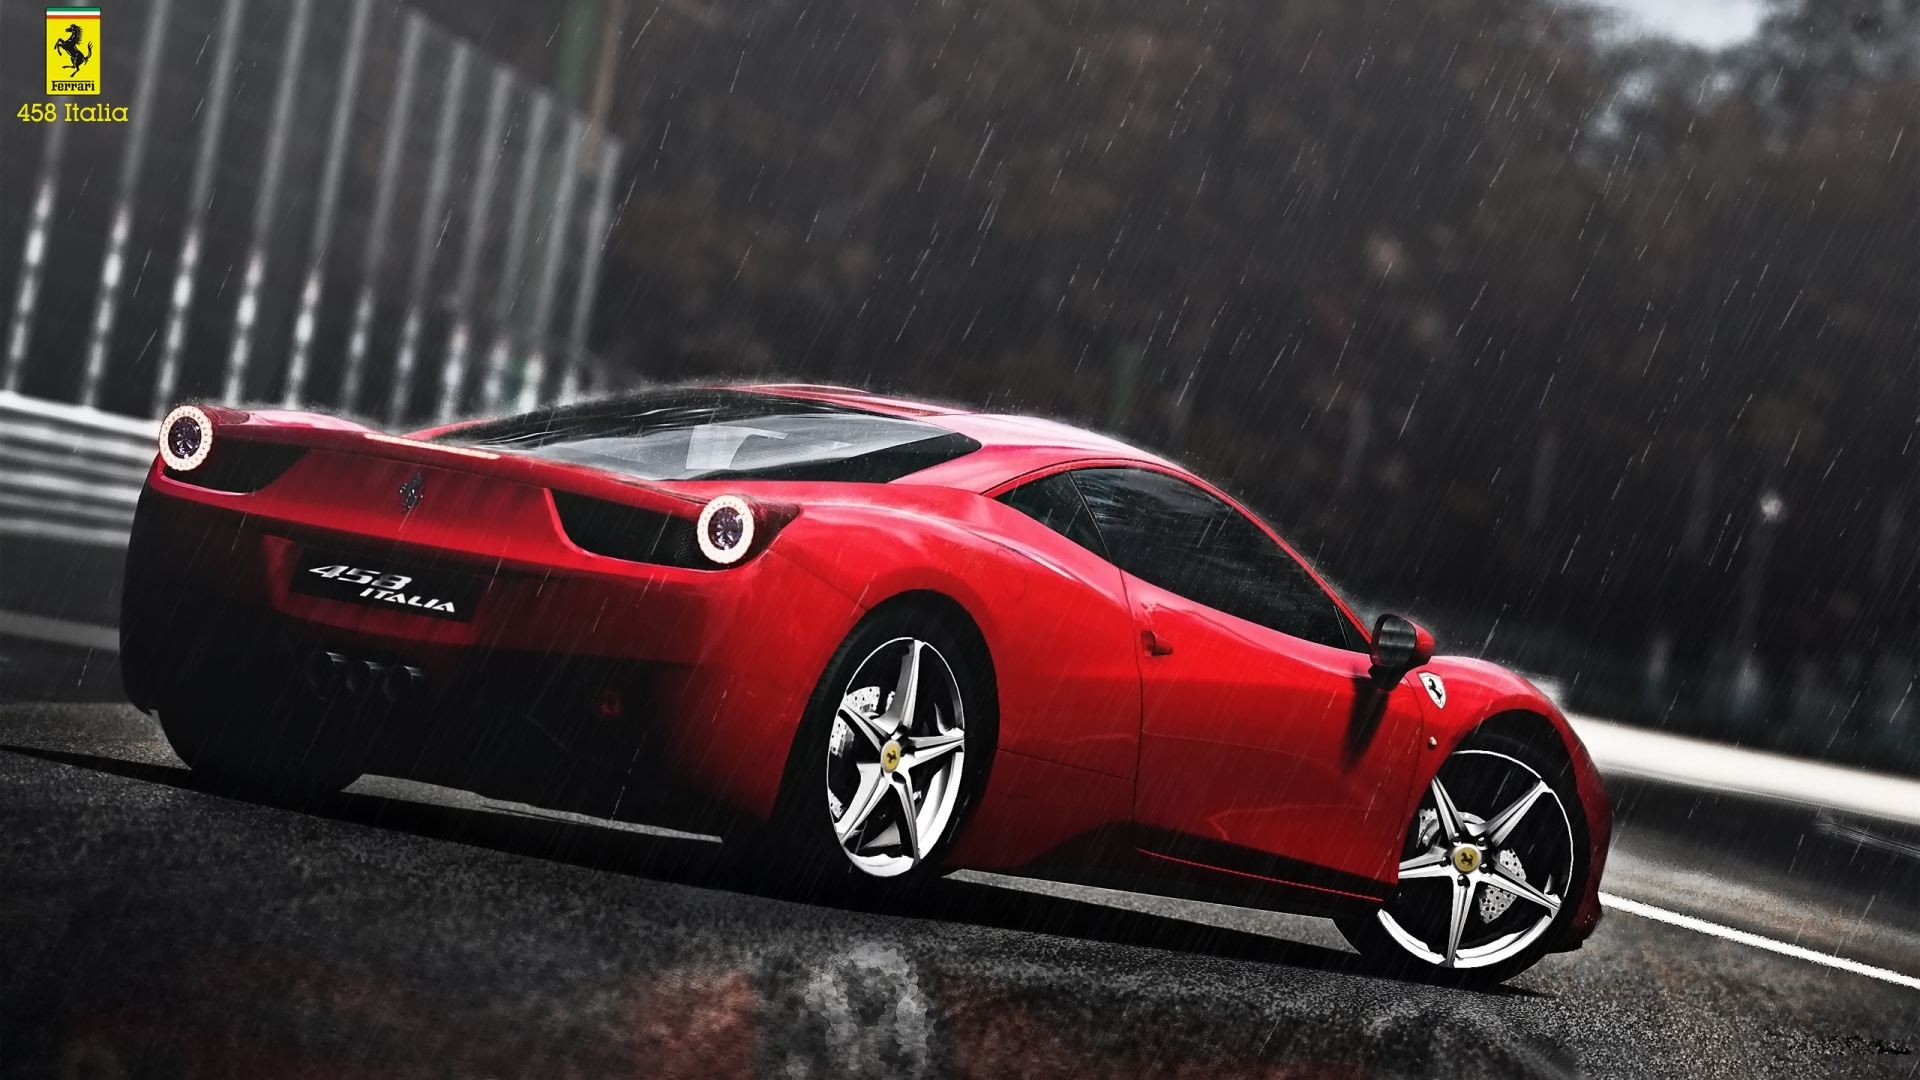 Ferrari 458 Italia wallpaper Car wallpapers 100 1920x1080